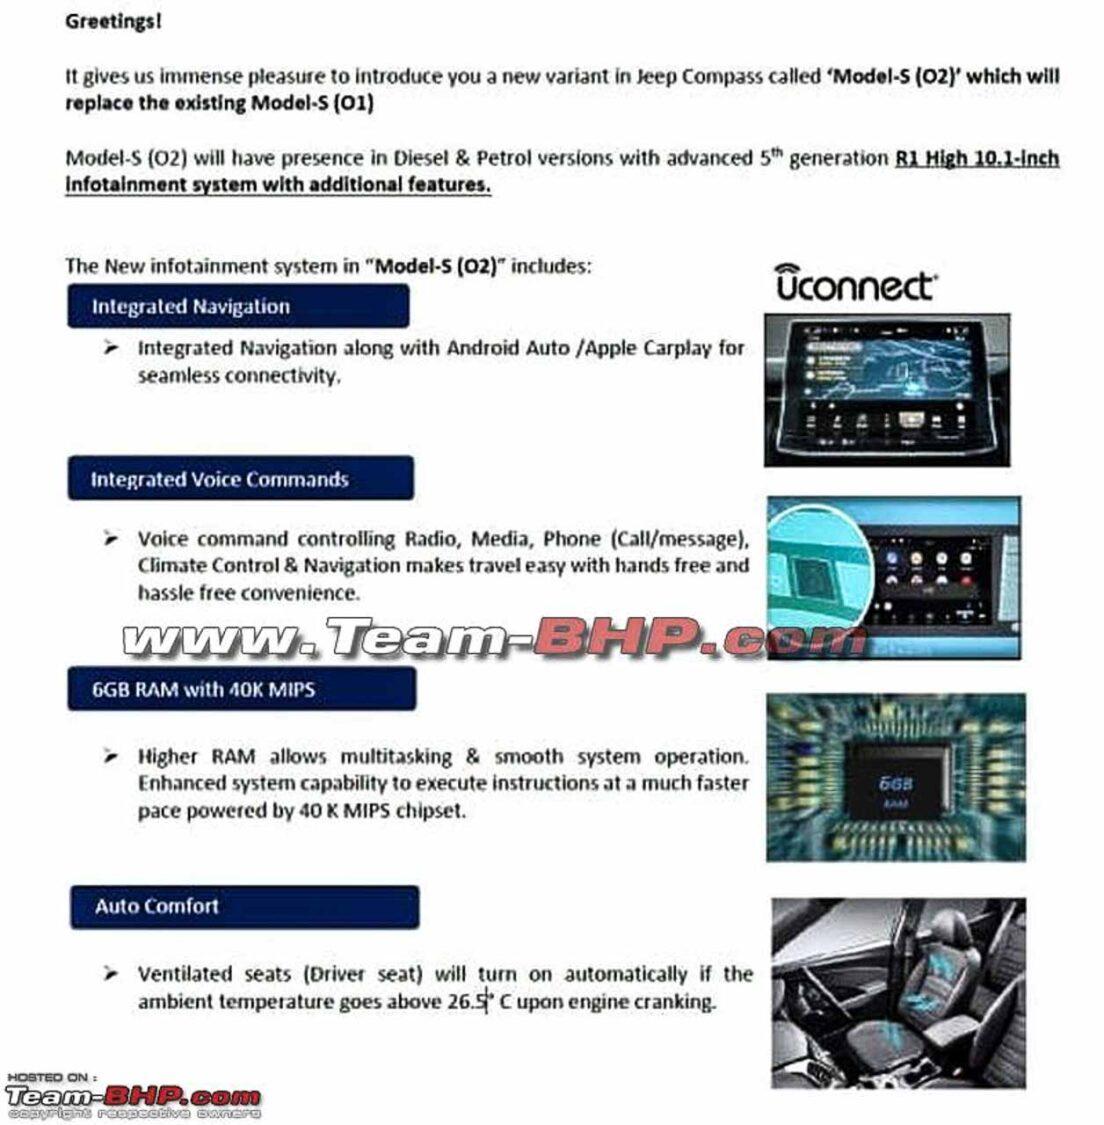 2021 Jeep Compass Model S Updates